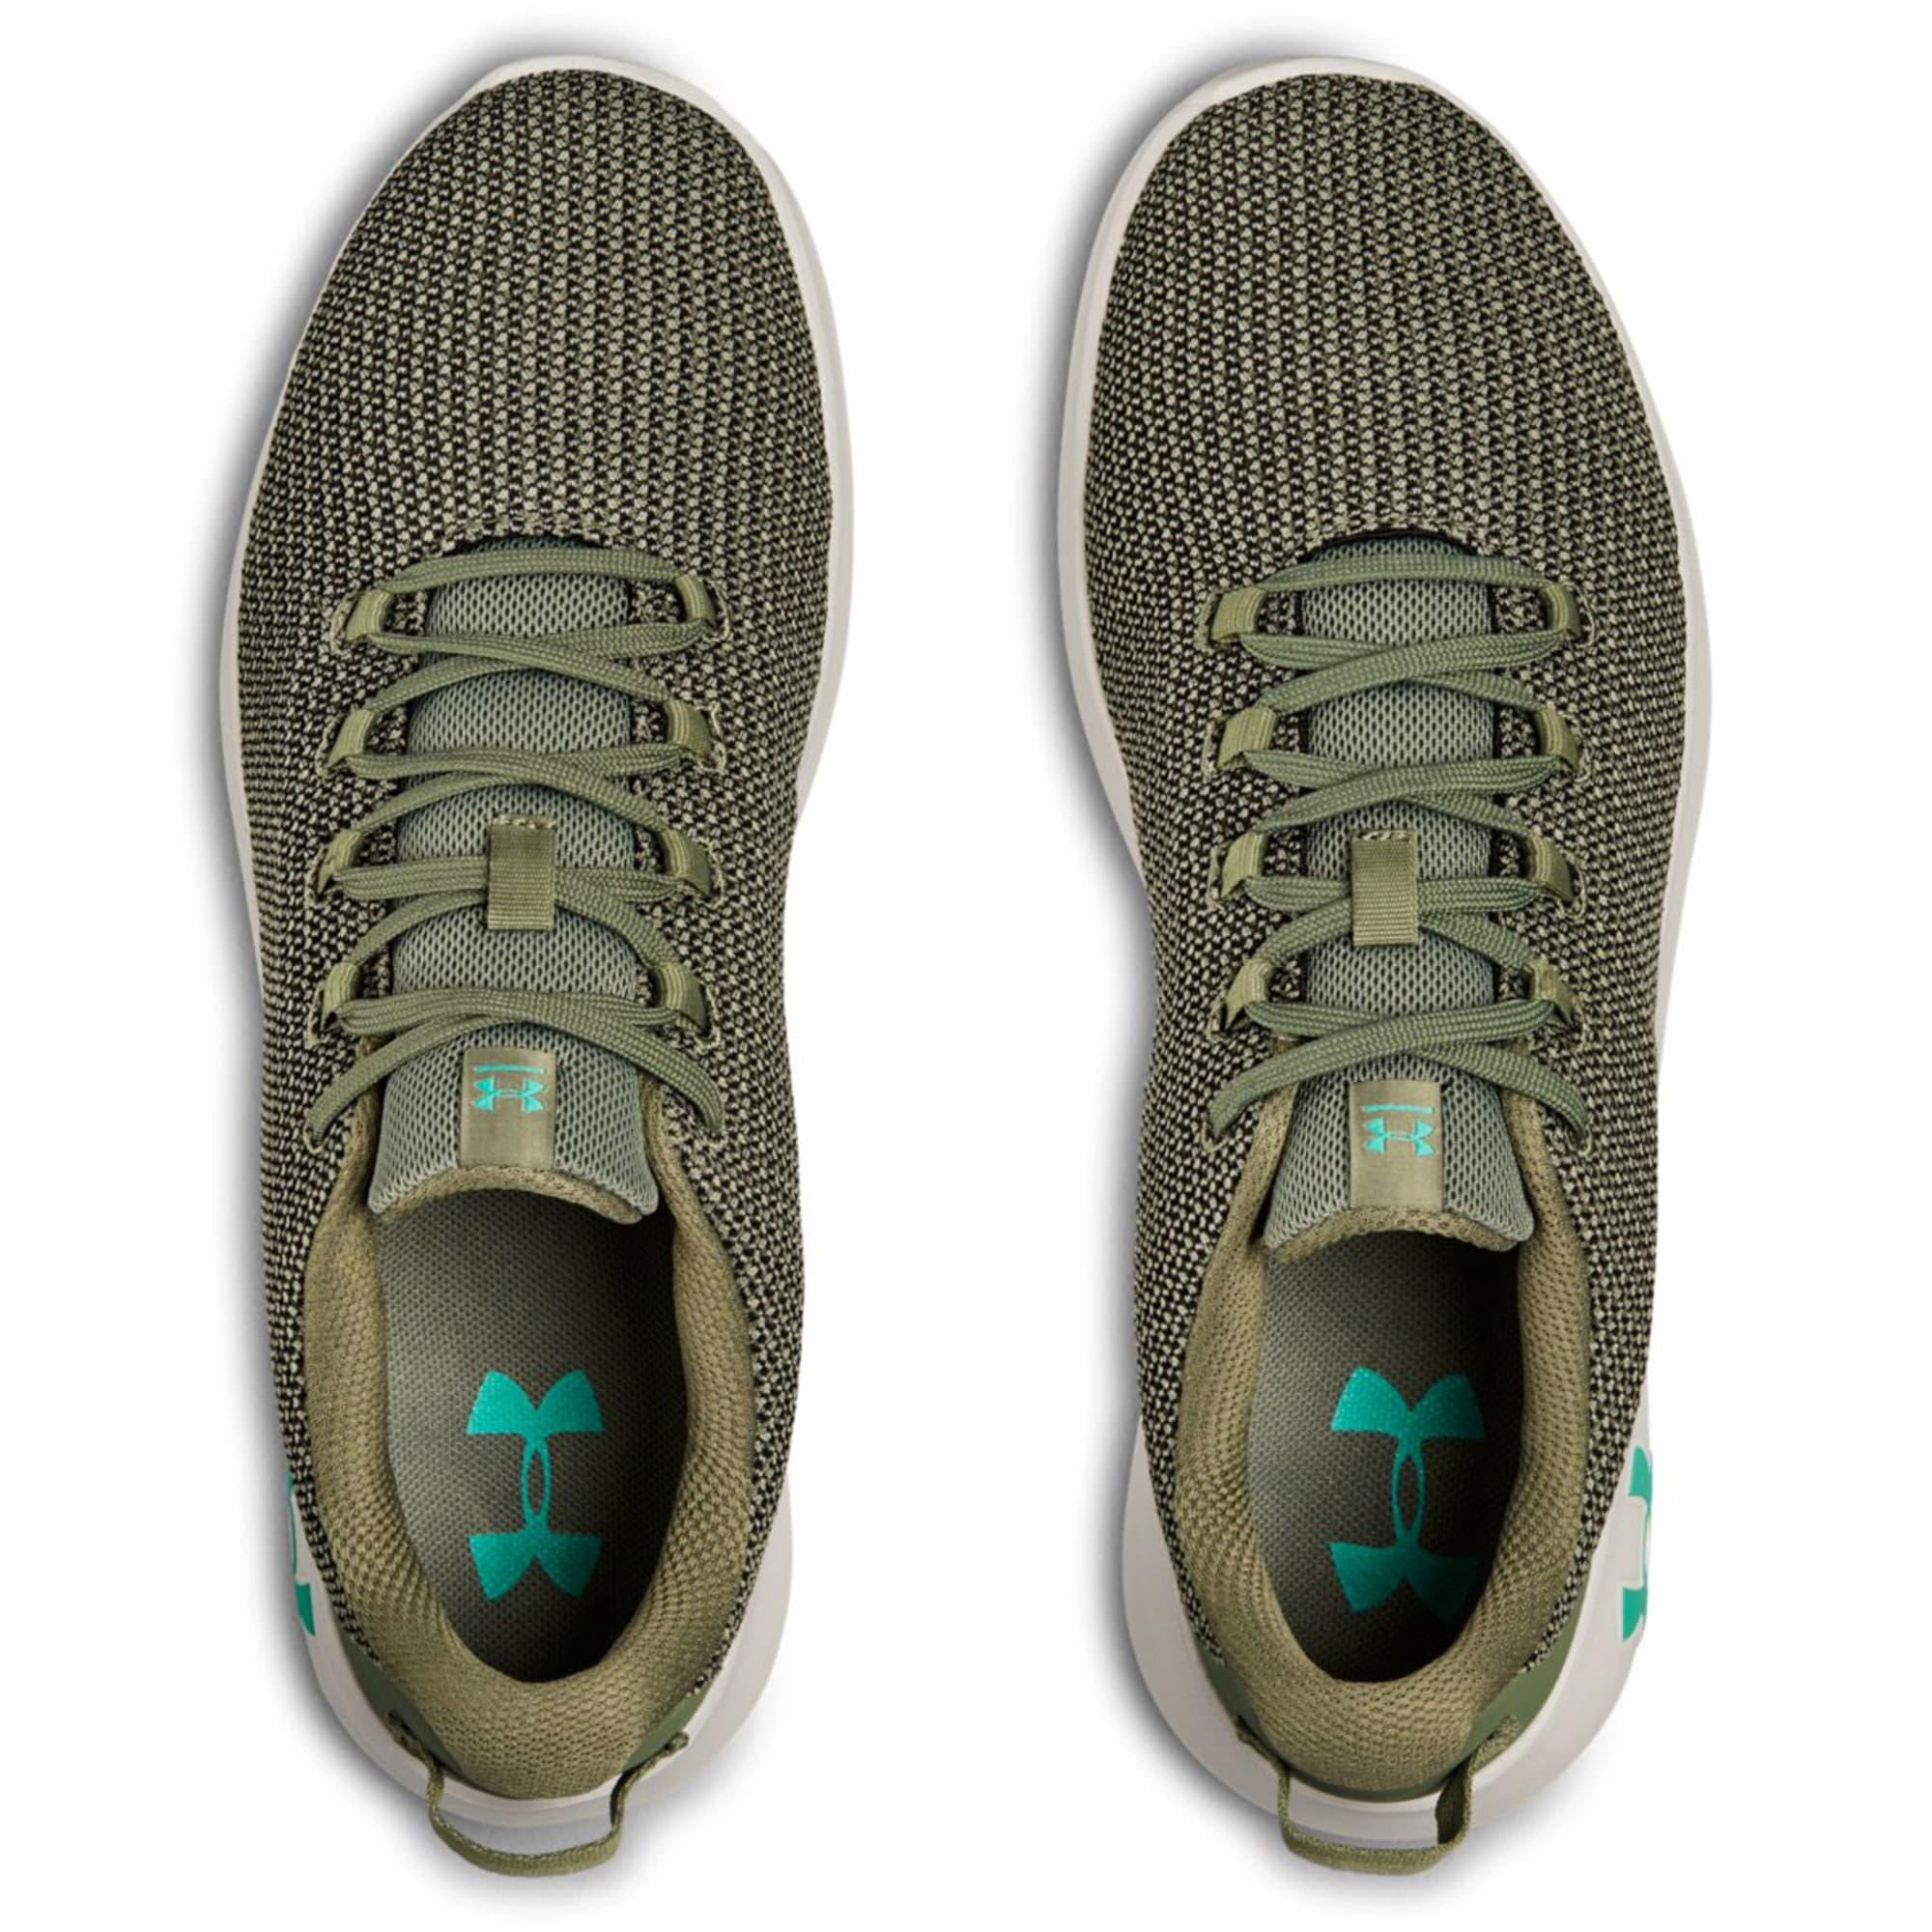 men's under armour ripple shoes